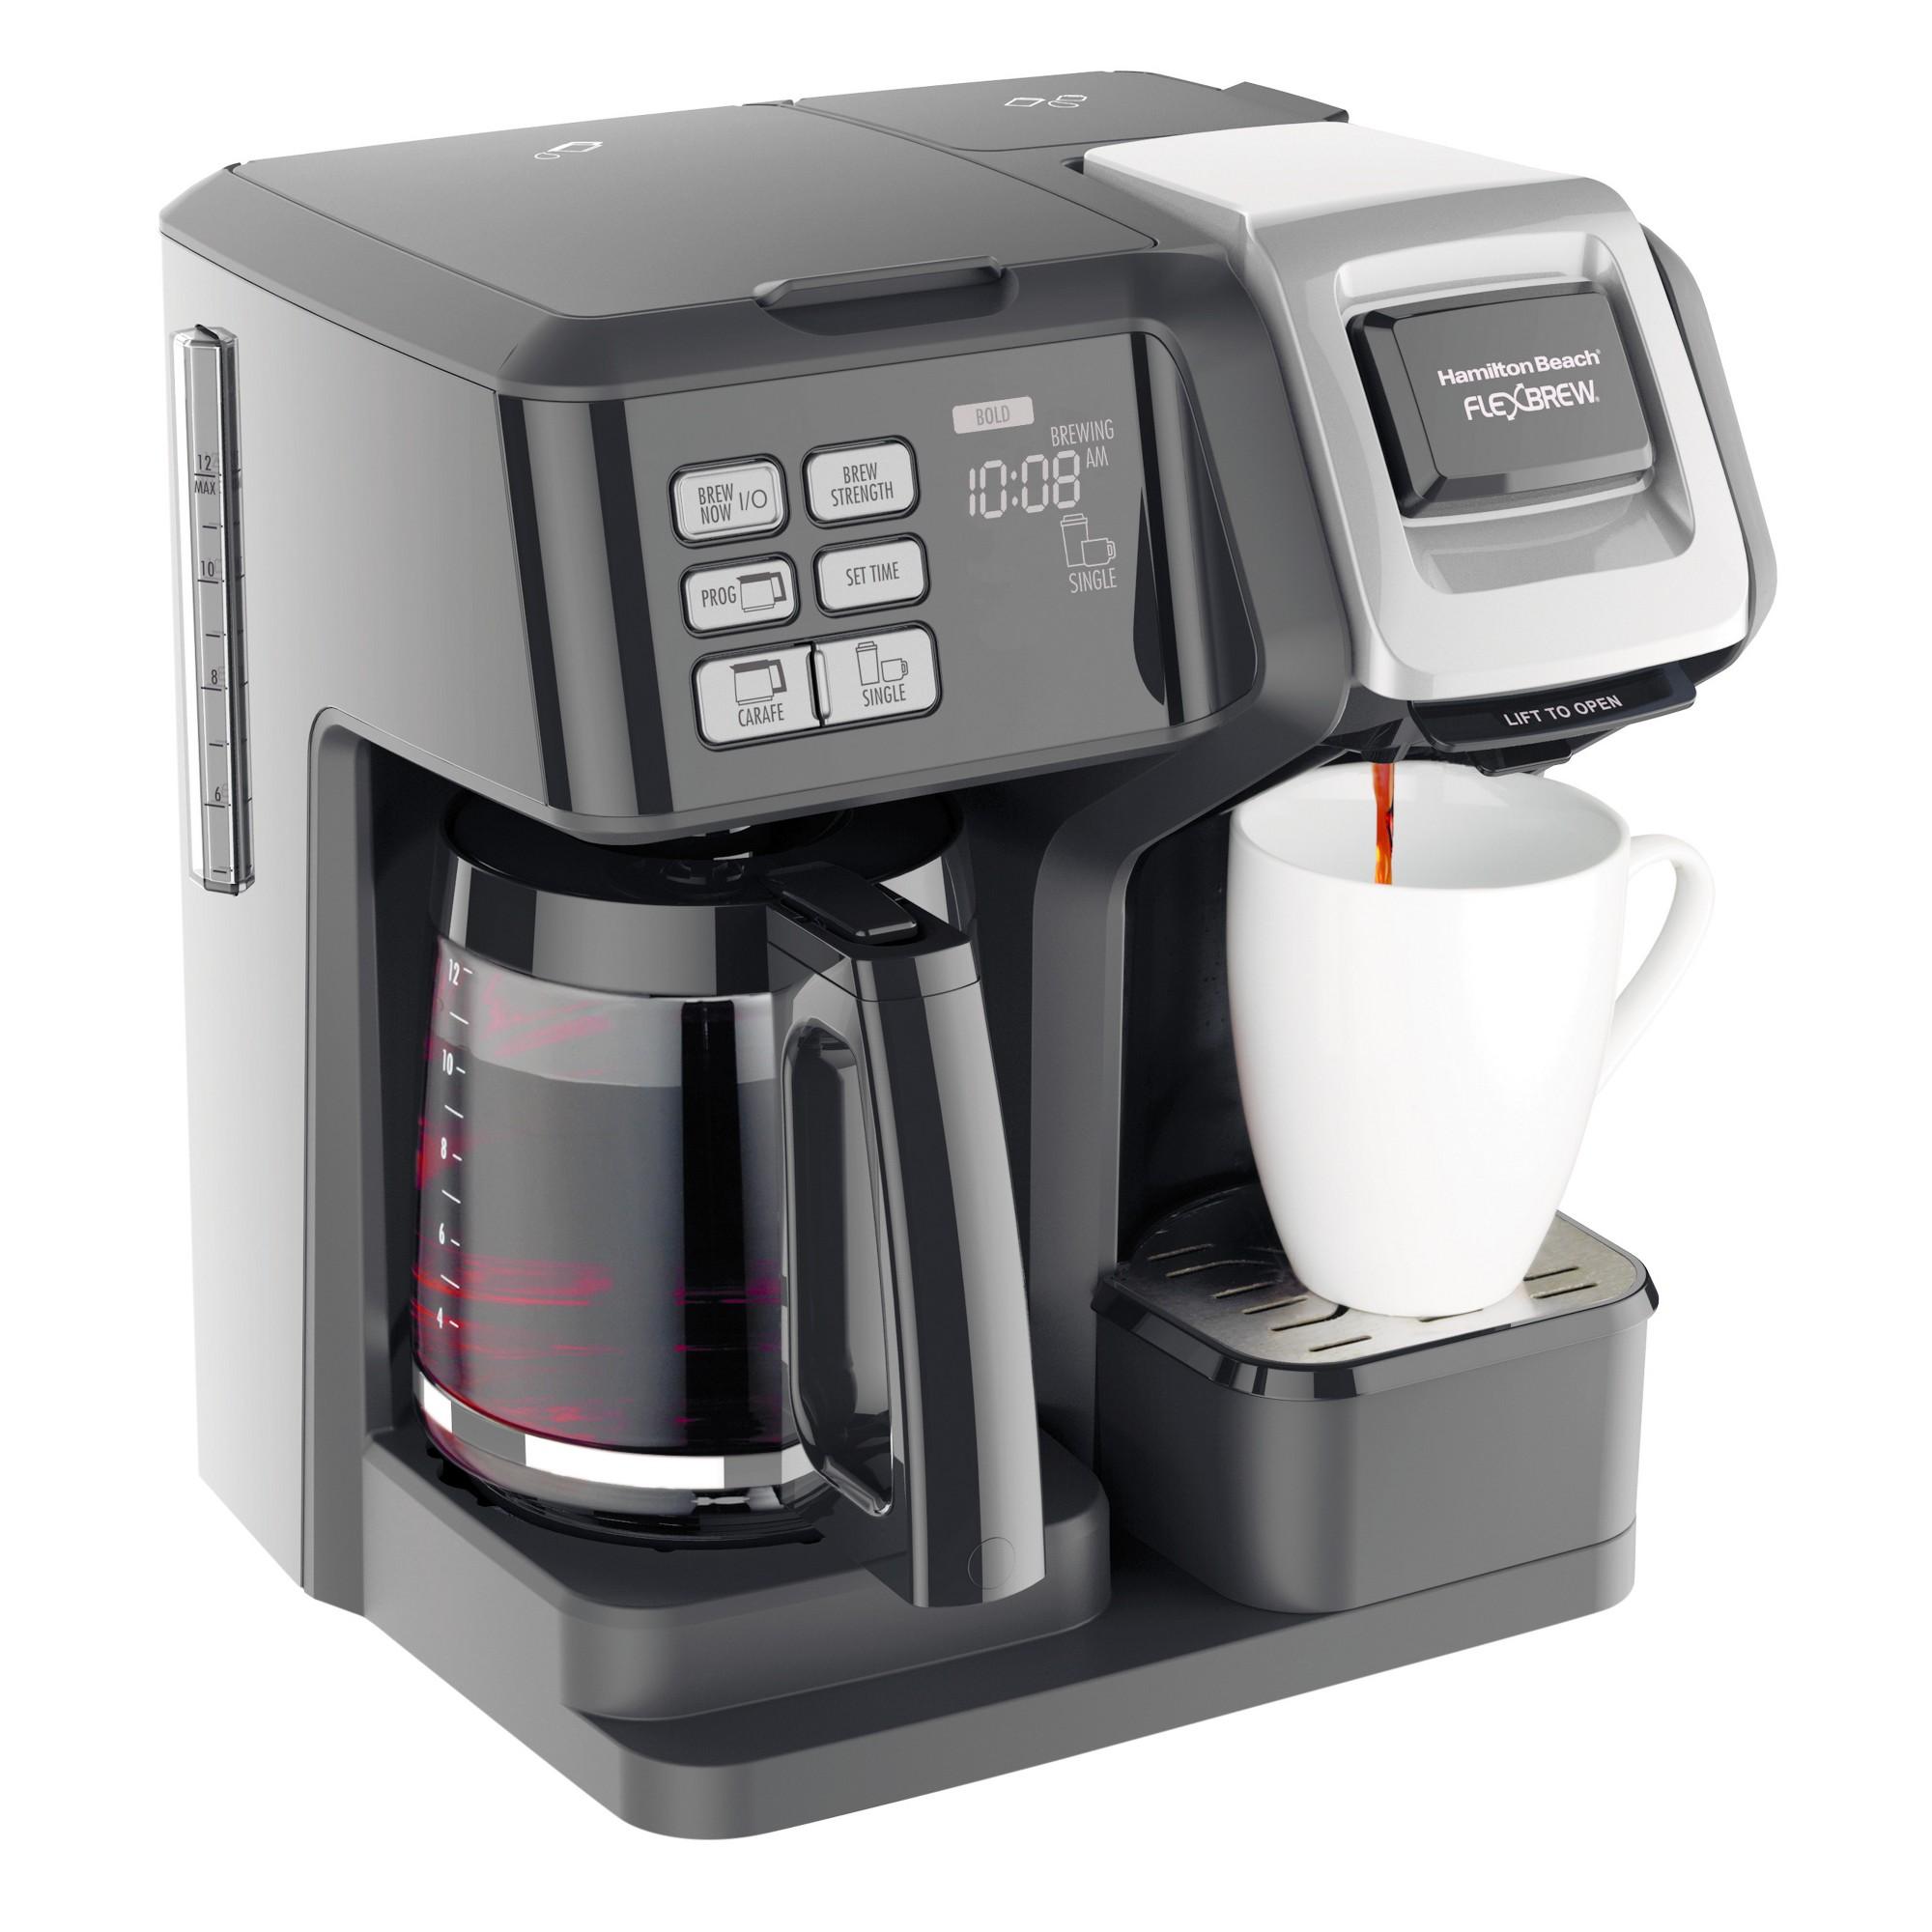 Hamilton Beach 2 Way Flex Brew 49976, Black Coffee maker